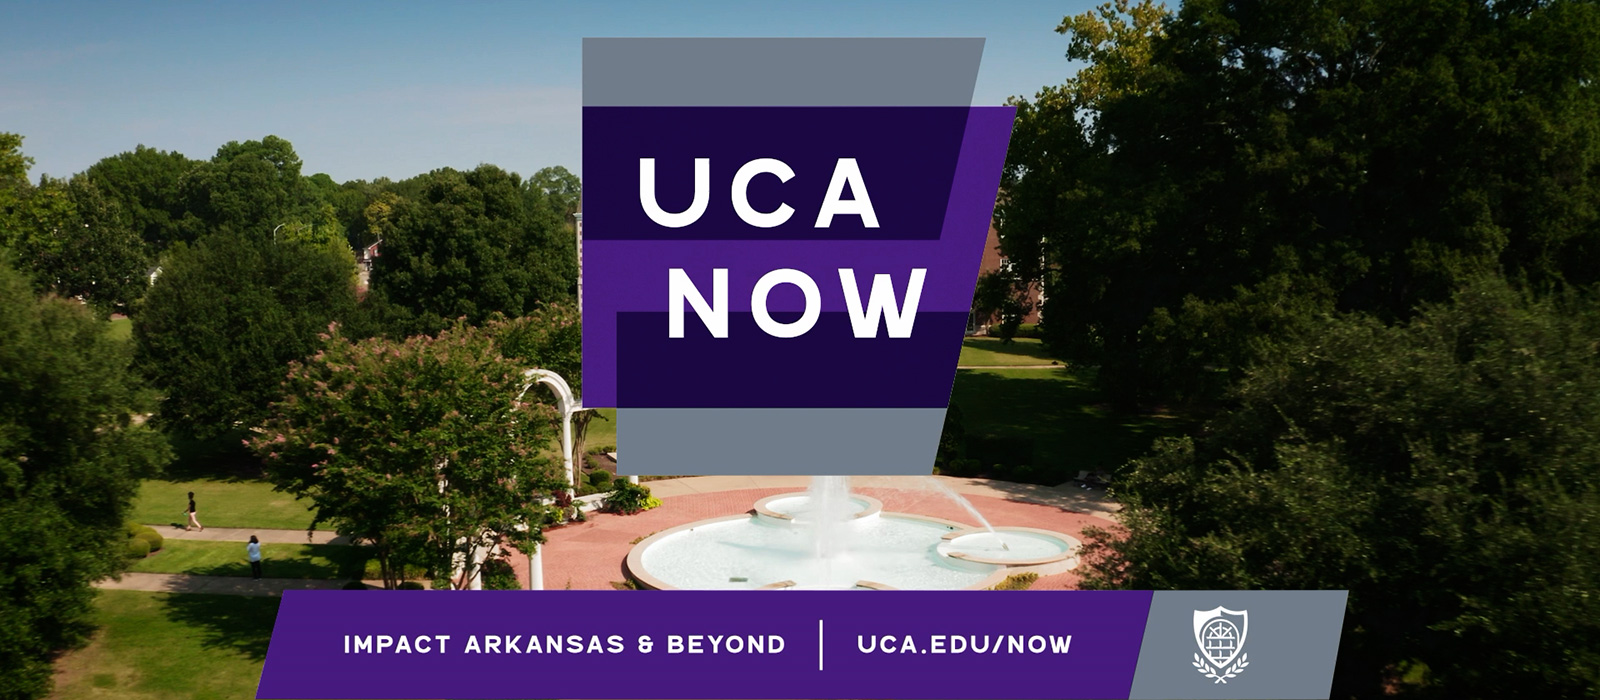 UCA Now, Impact Arkansas & Beyond